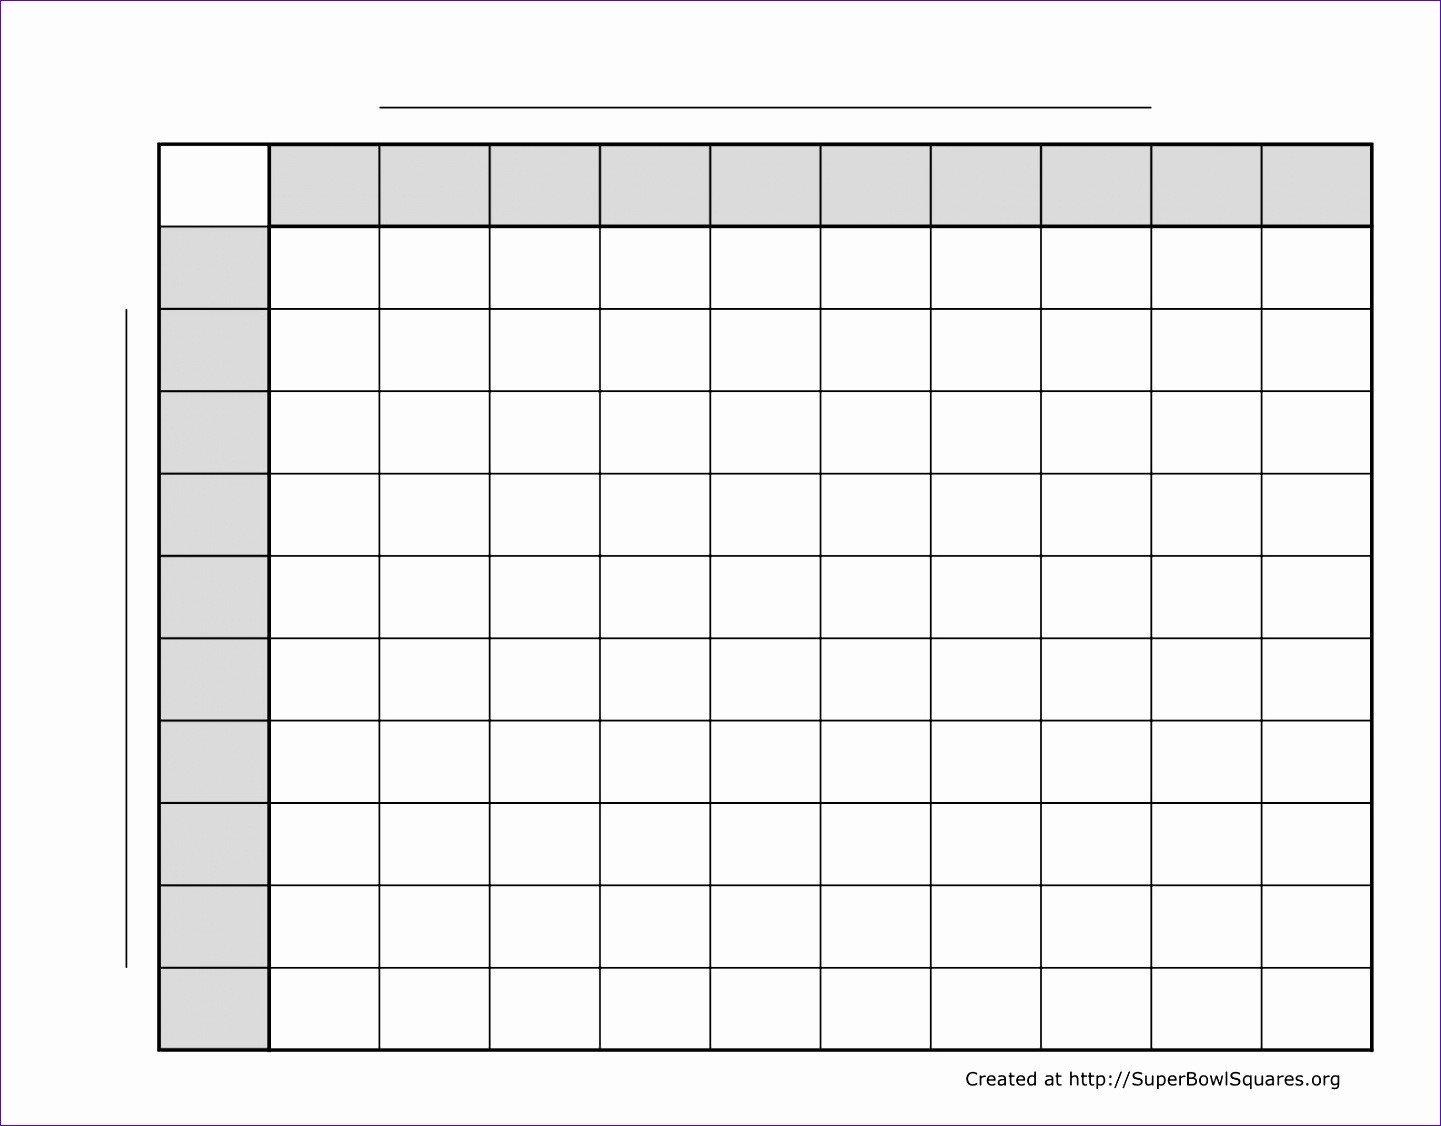 Super Bowl Squares Template Excel 10 Super Bowl Squares Template Excel Exceltemplates